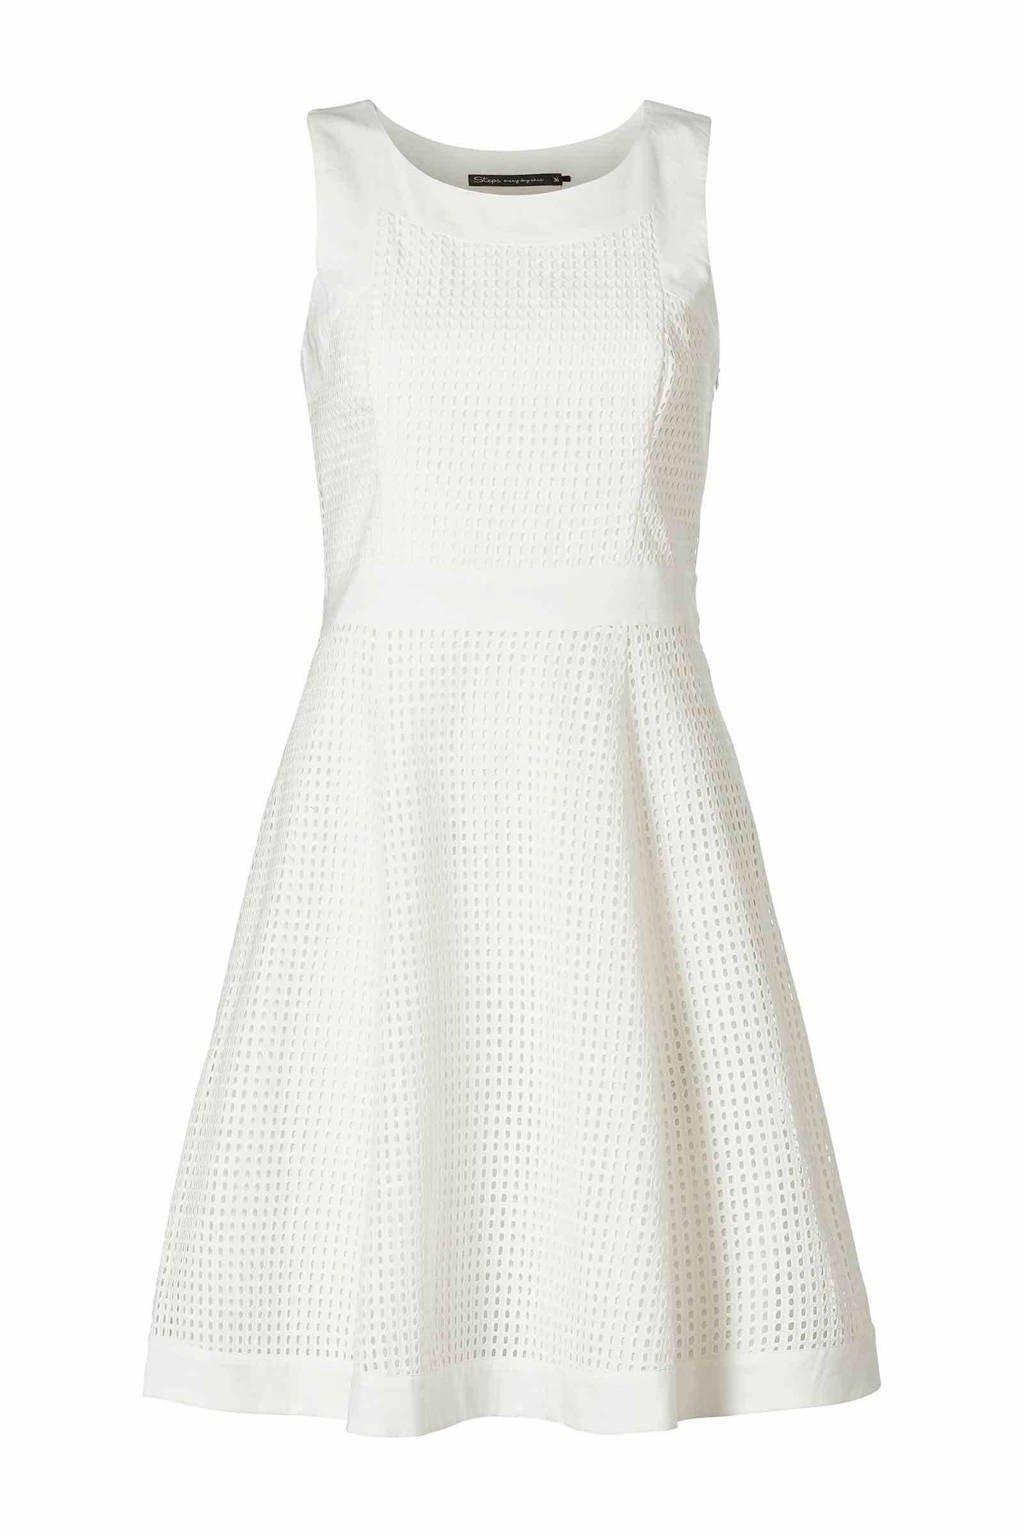 Steps jurk, Gebroken wit